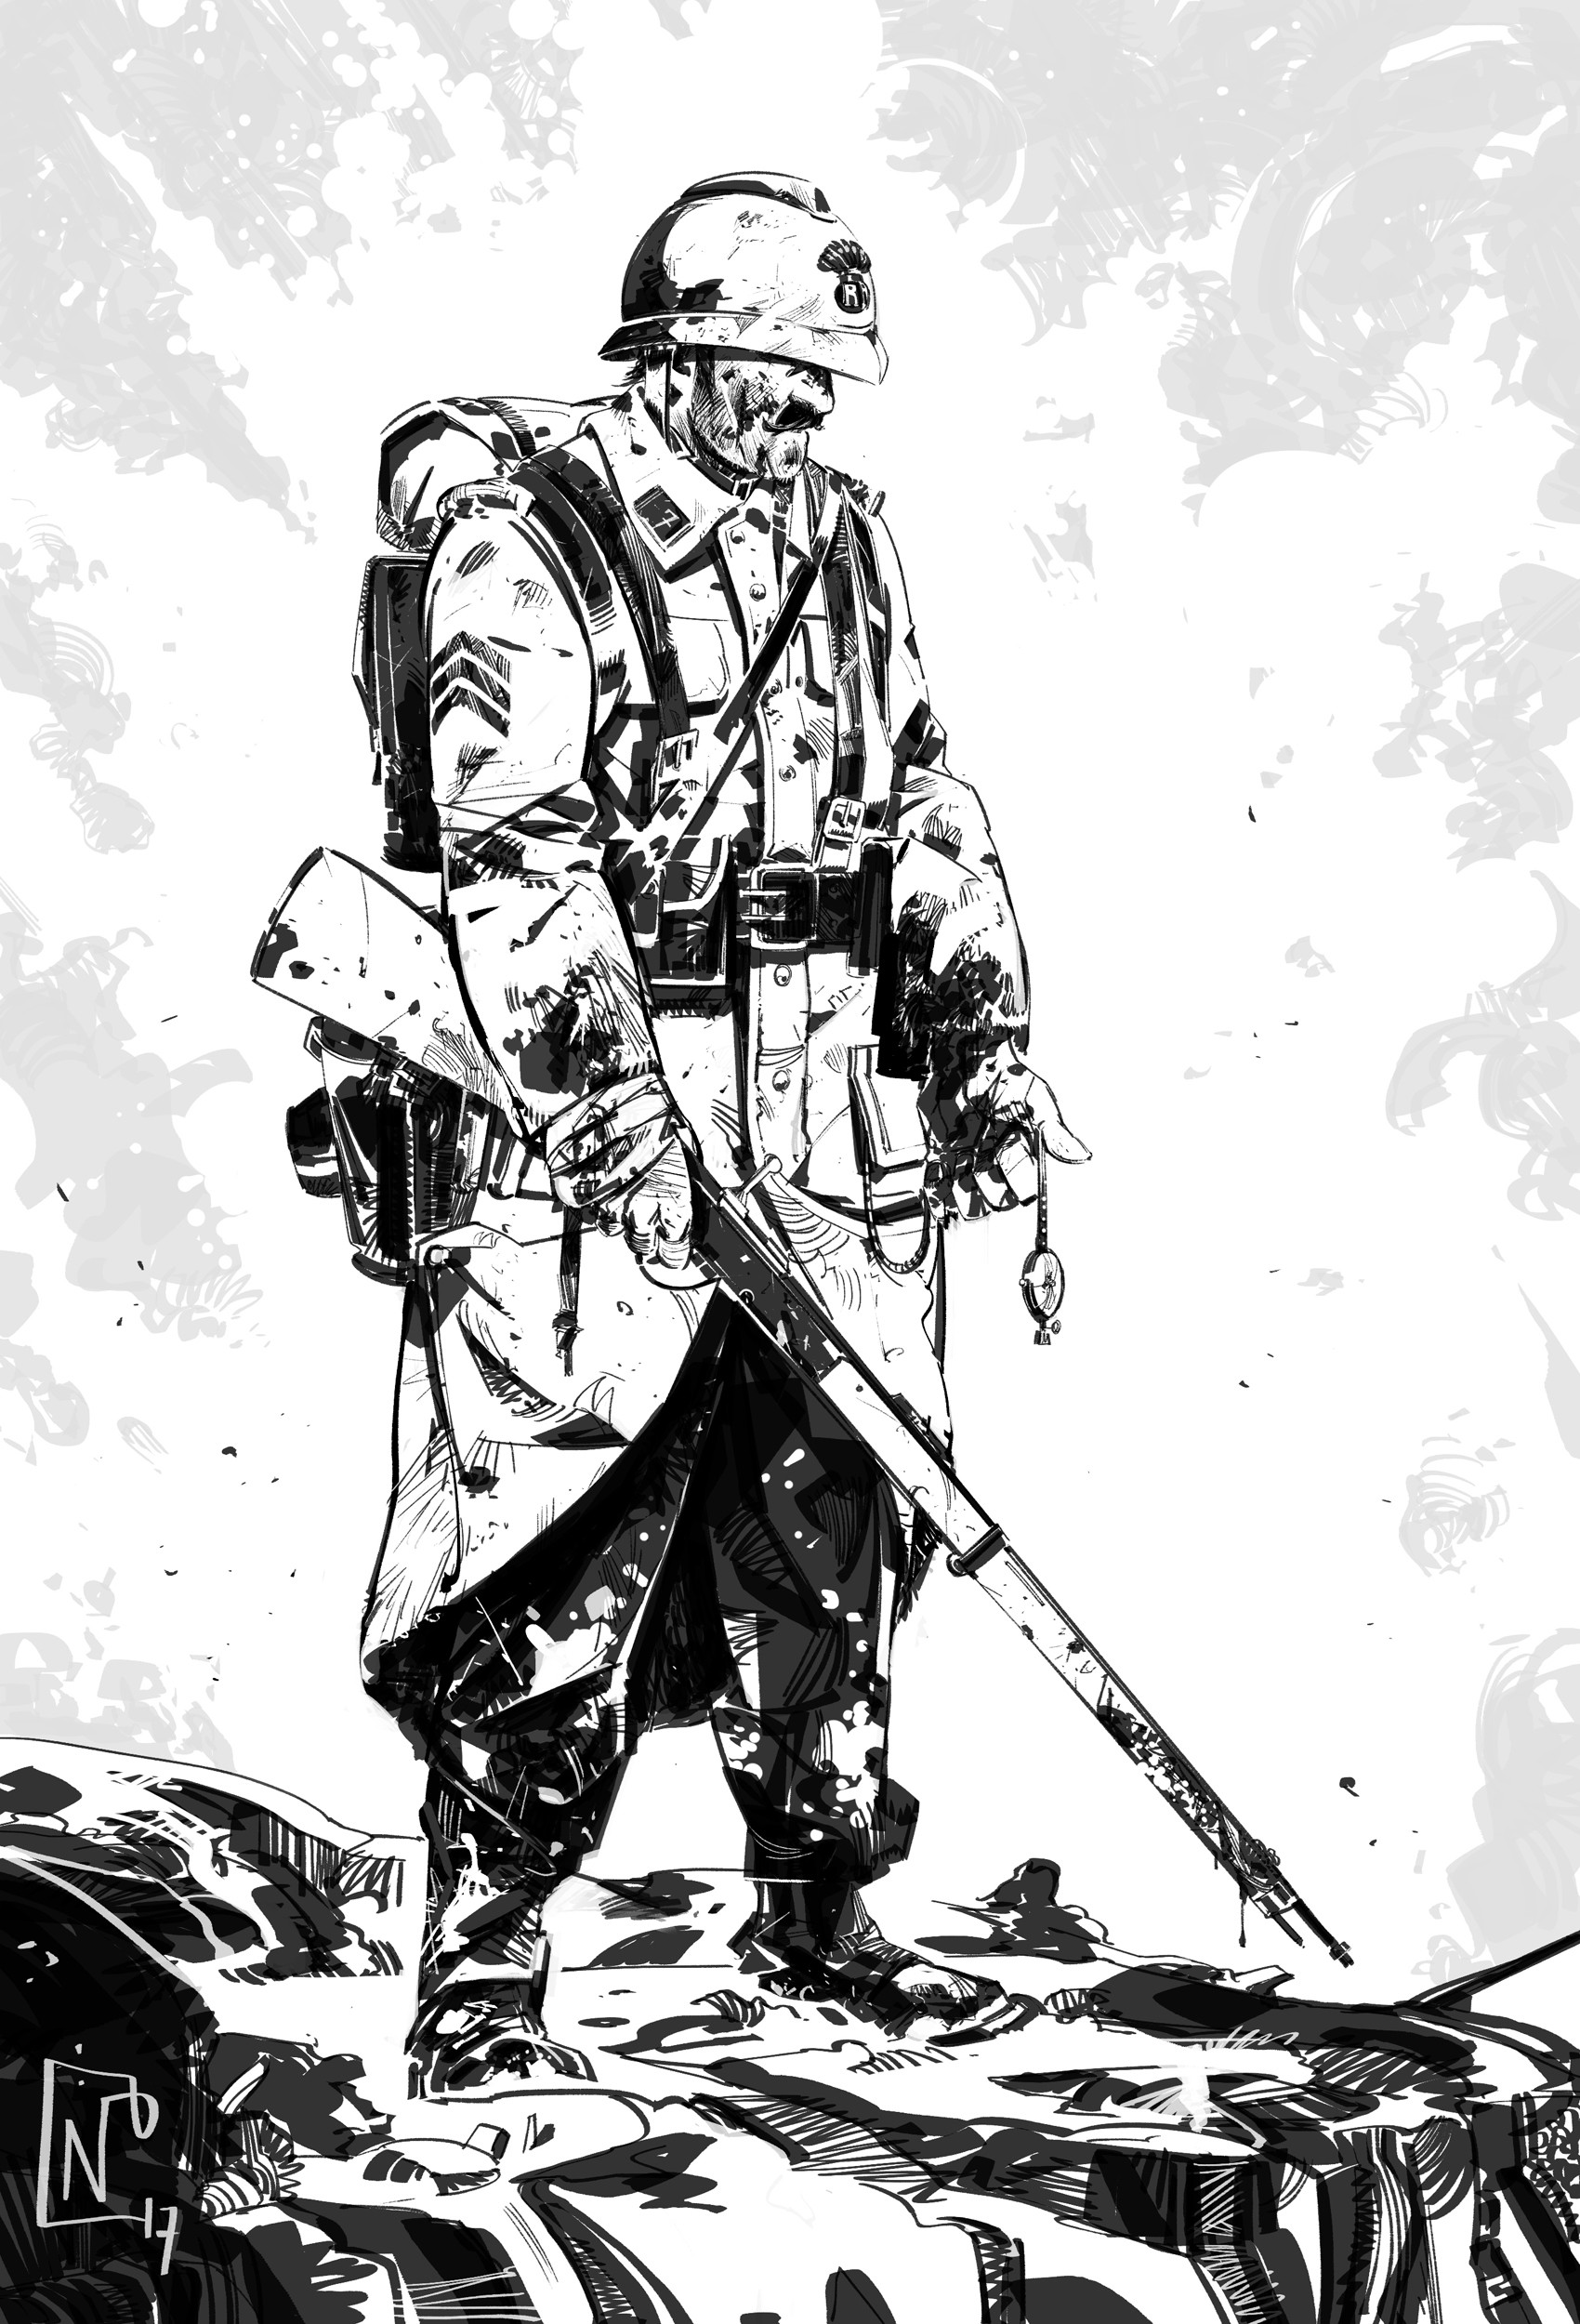 Nicolas petrimaux ww1 soldier 07